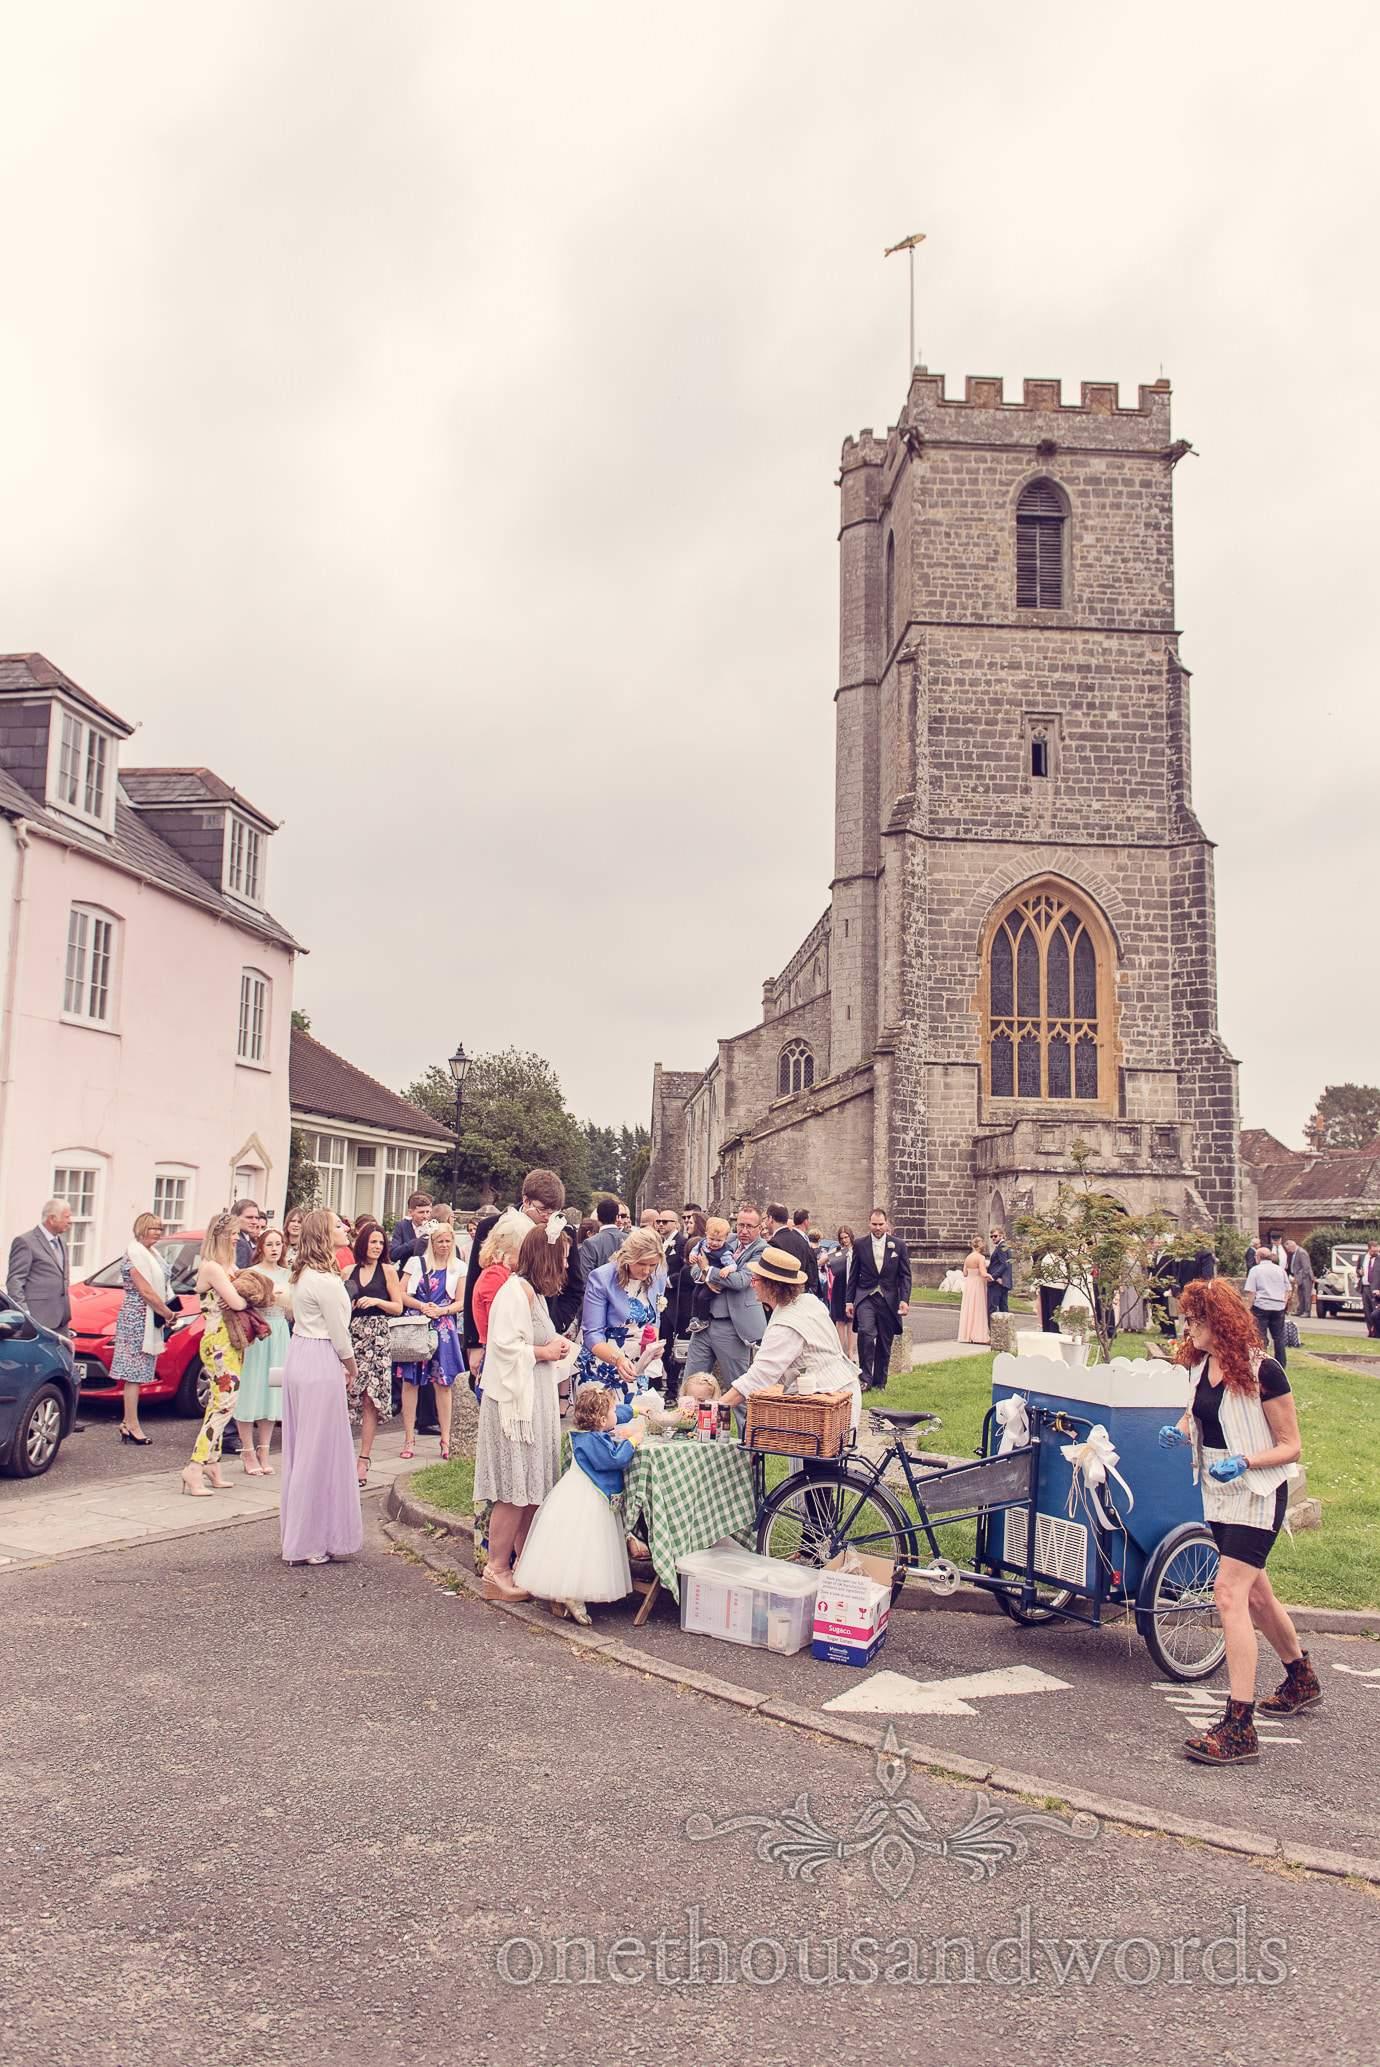 Ice cream tricycle outside St Marys Church wedding in Wareham, Dorset